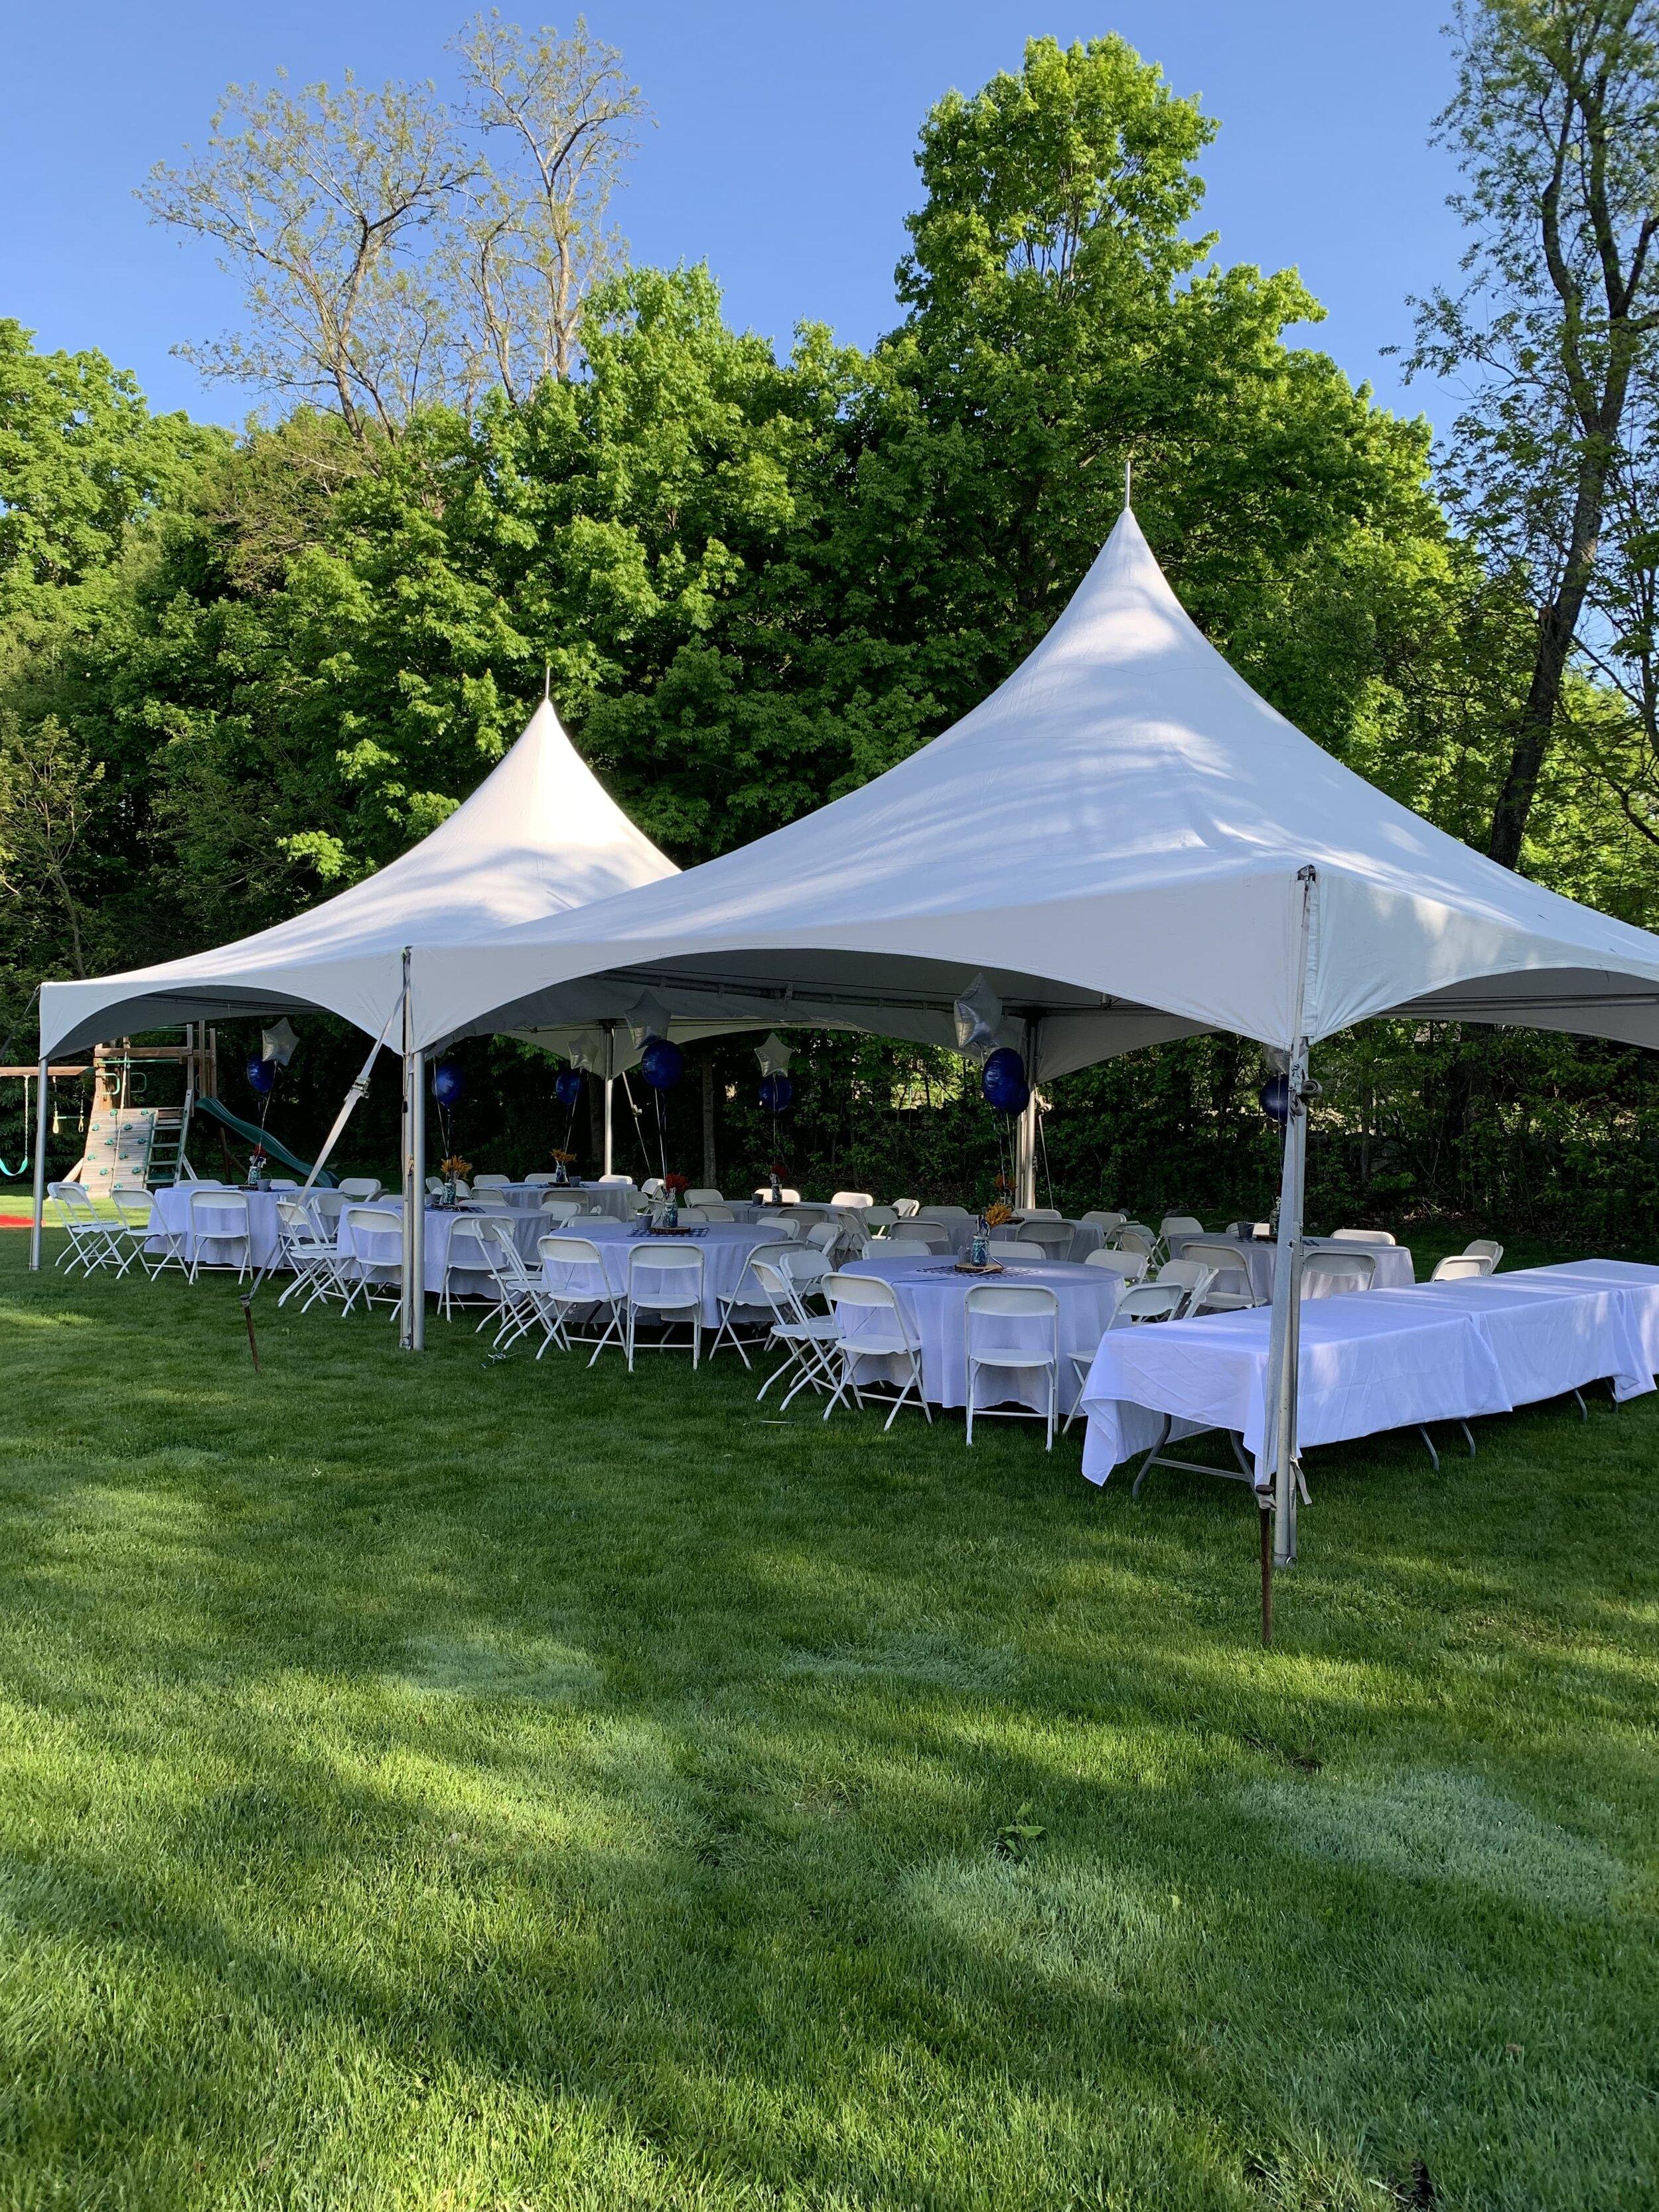 Backyard Tent Rental Bridgewater Tent Rentals South Shore Ma